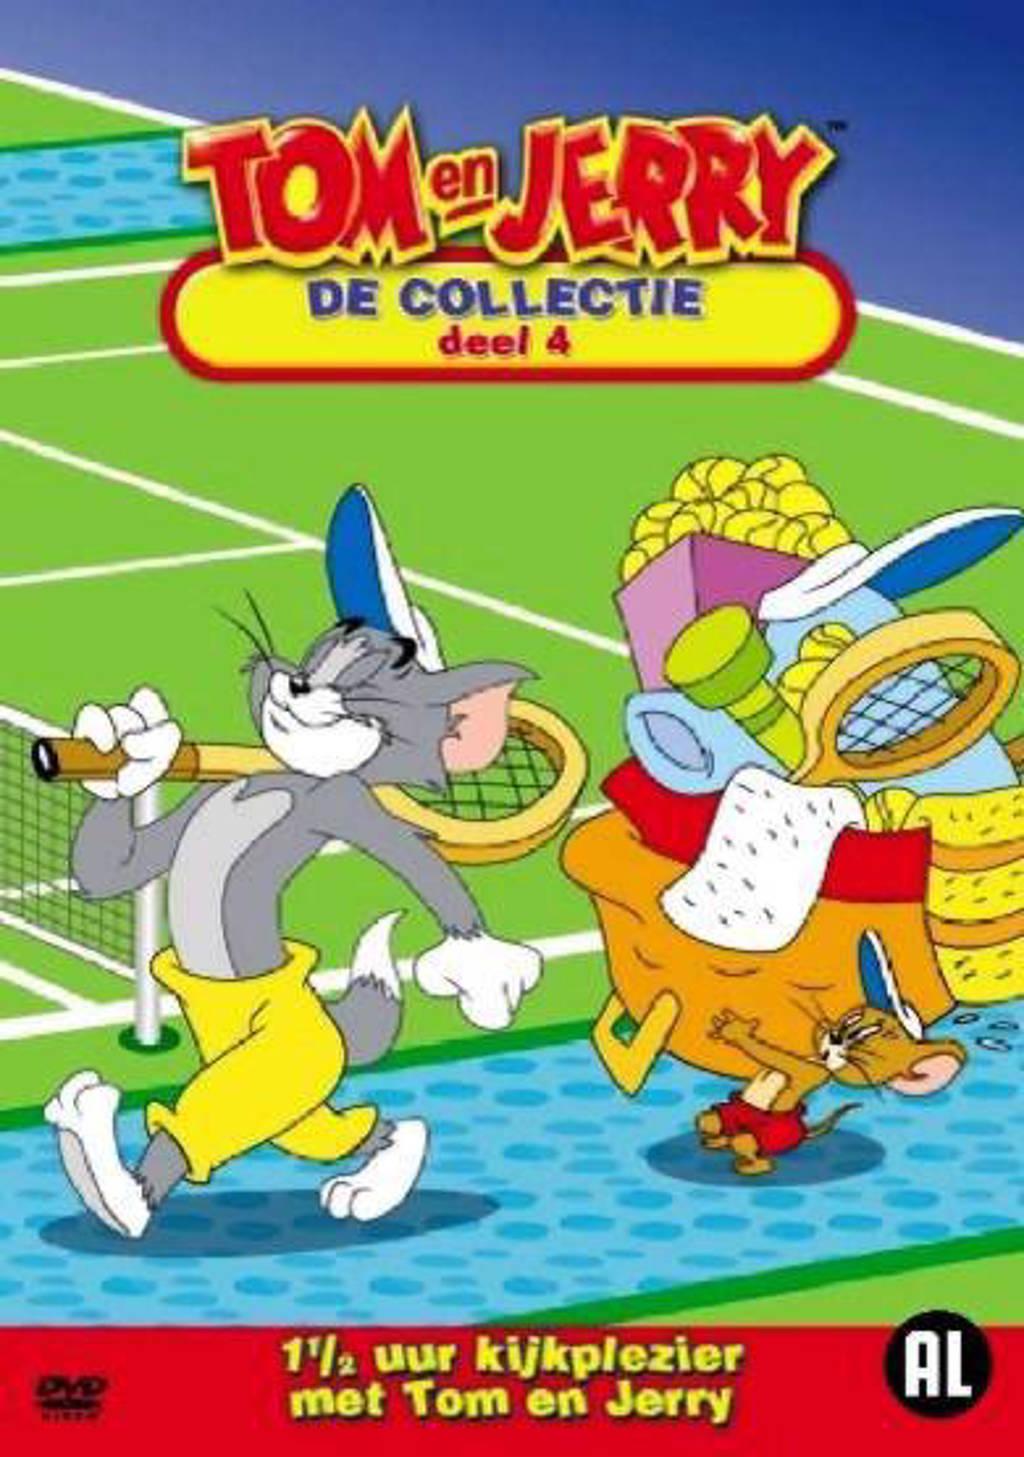 Tom & Jerry - De collectie 4 (DVD)